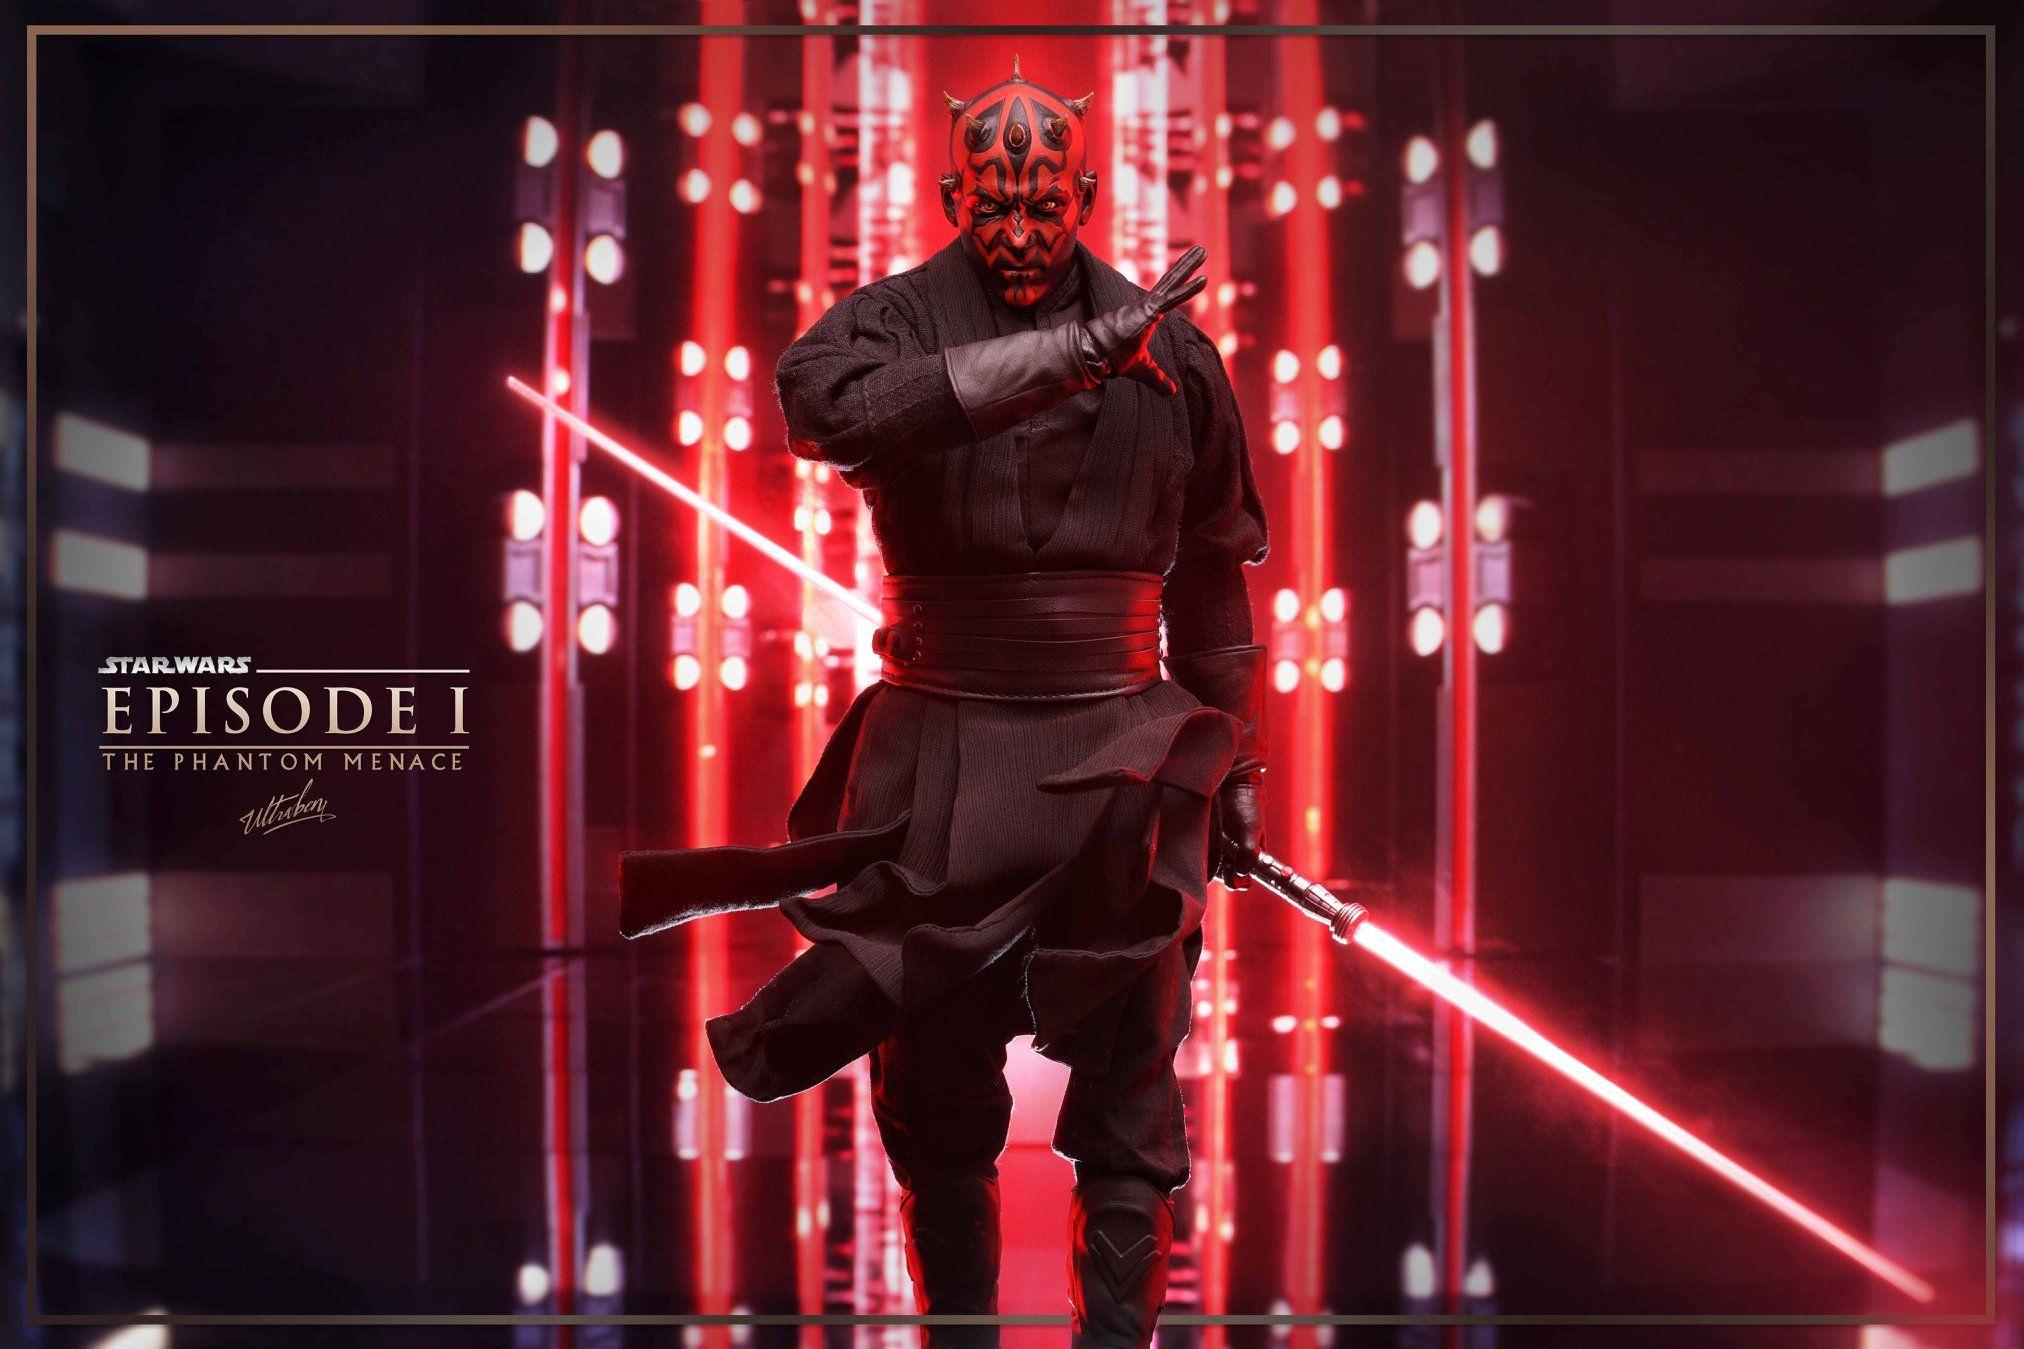 Movie Star Wars Episode I The Phantom Menace Star Wars ...